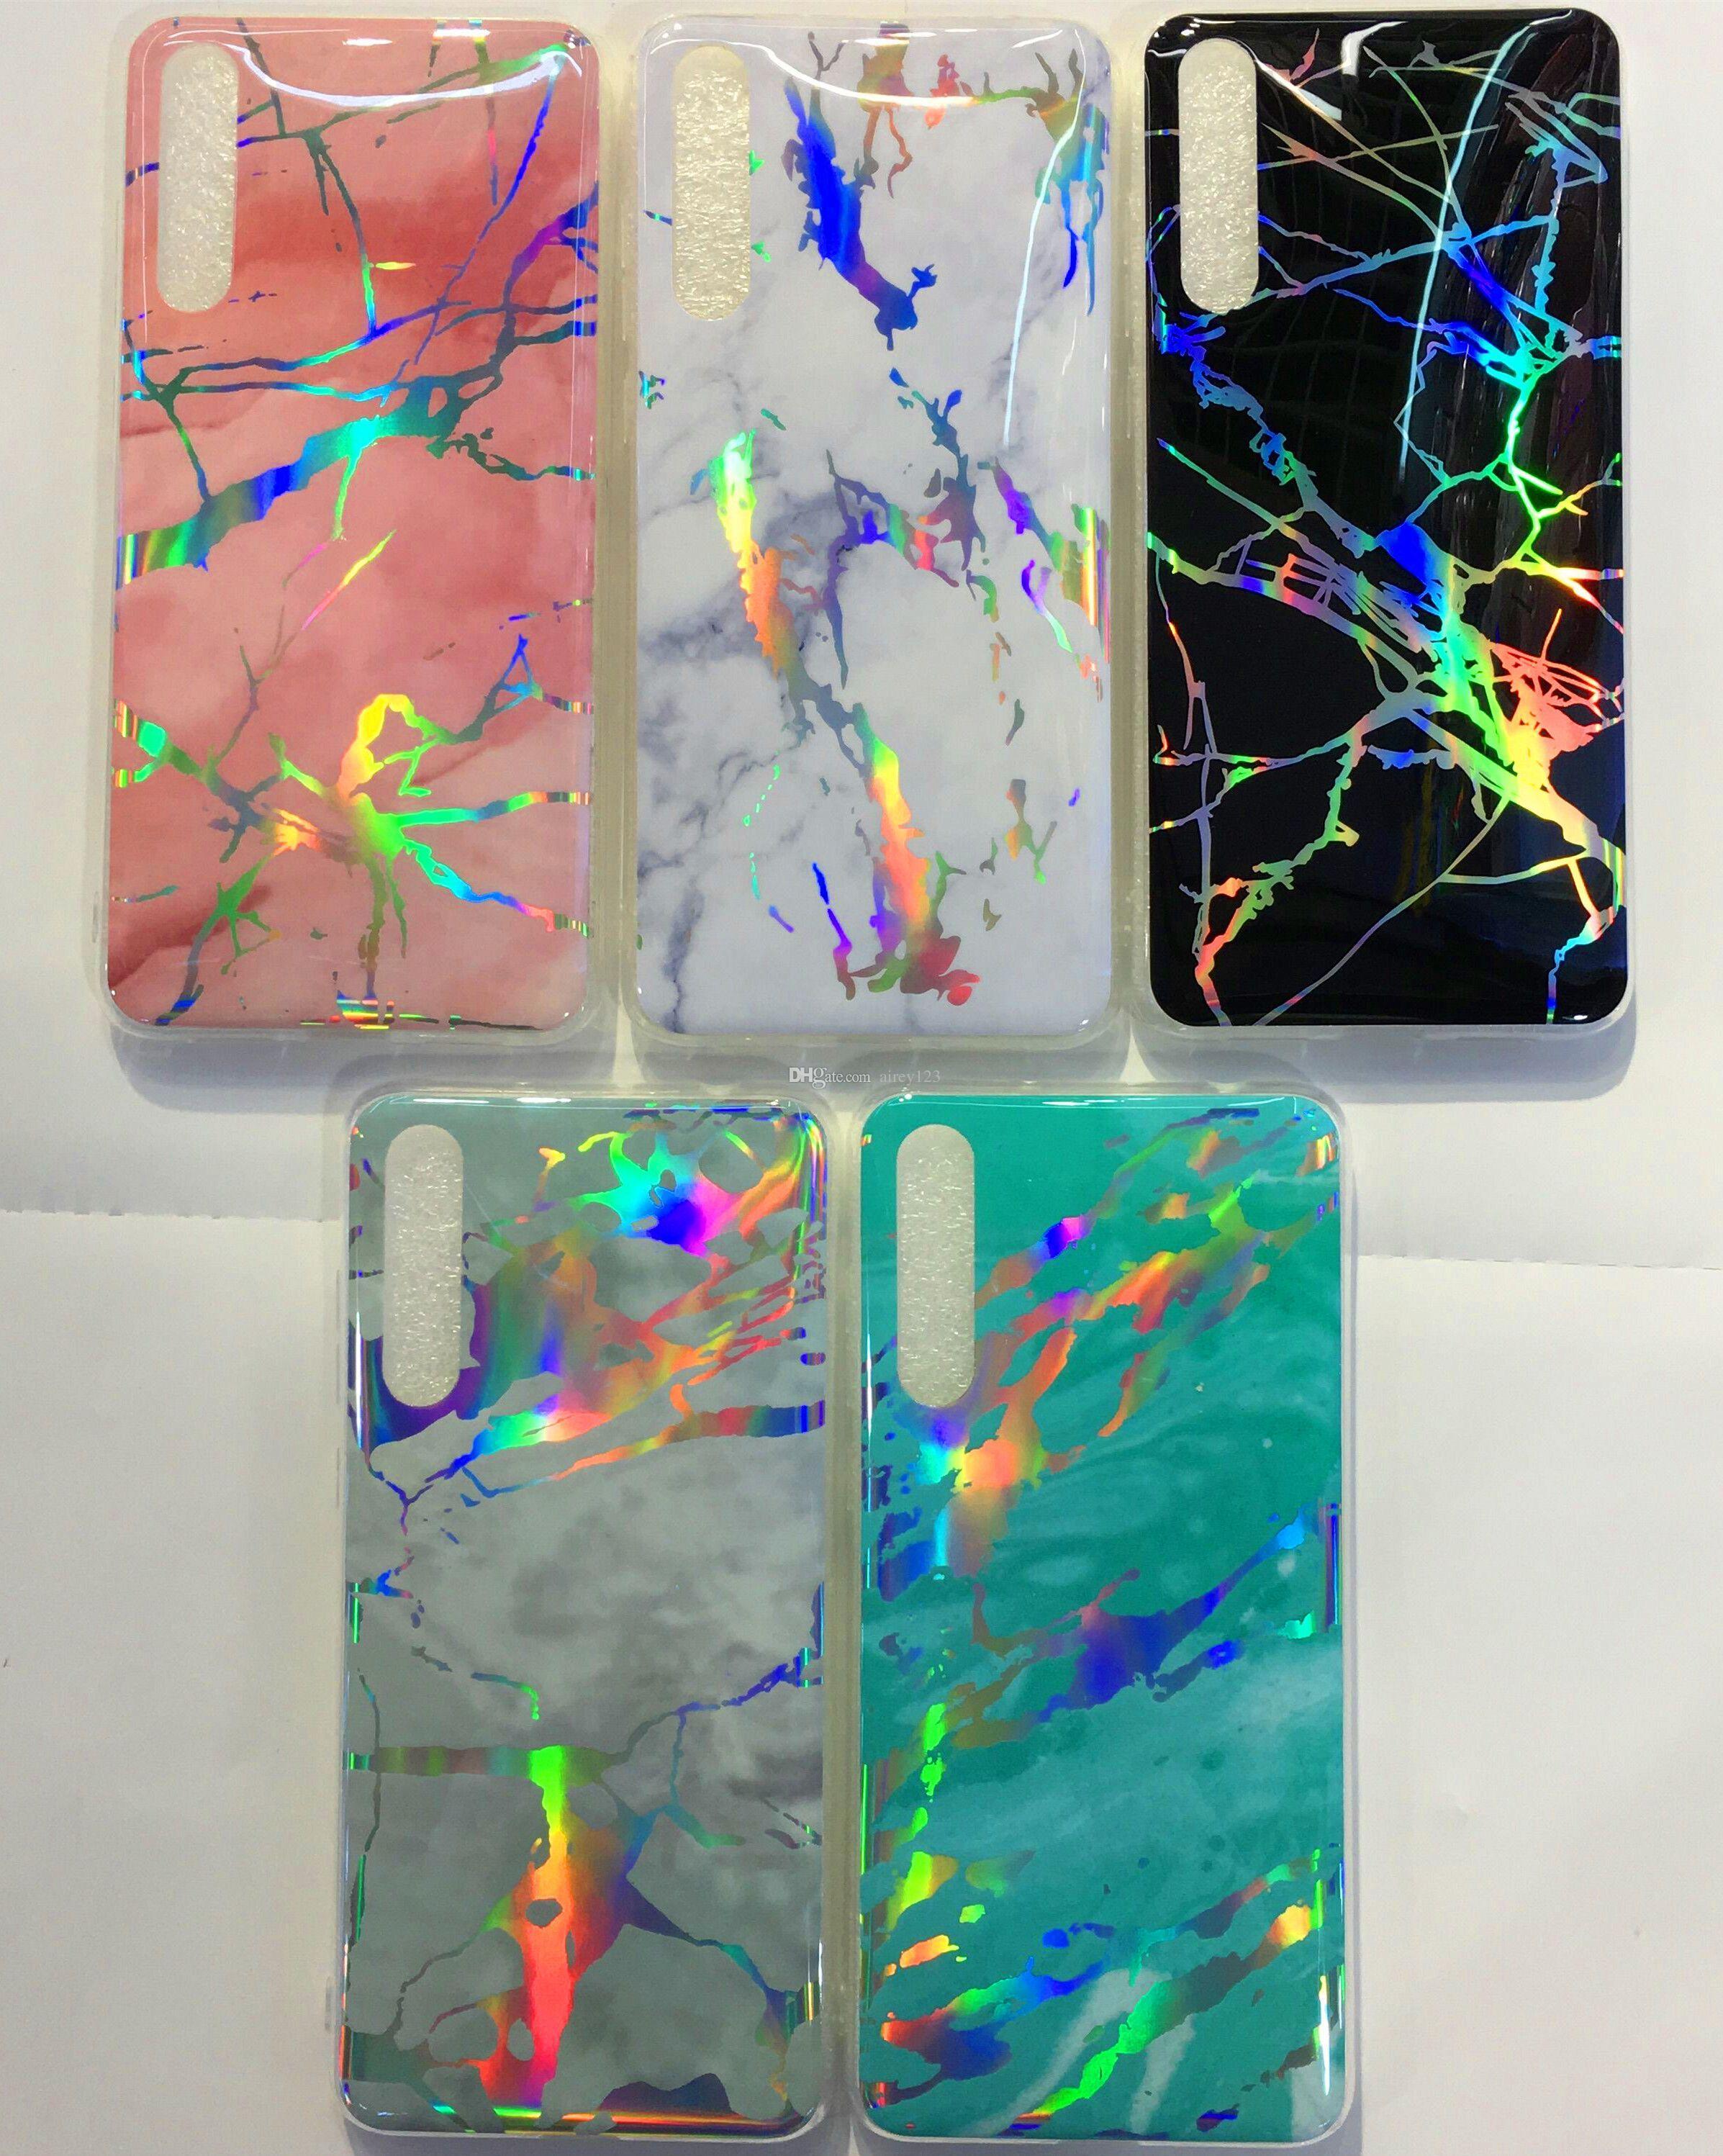 Holo TPU Laser Cover Chrome Marble Case for iPhone X XS 6 7 8 Plus Huawei P20 Pro/Lite Nova 3/3e/3i